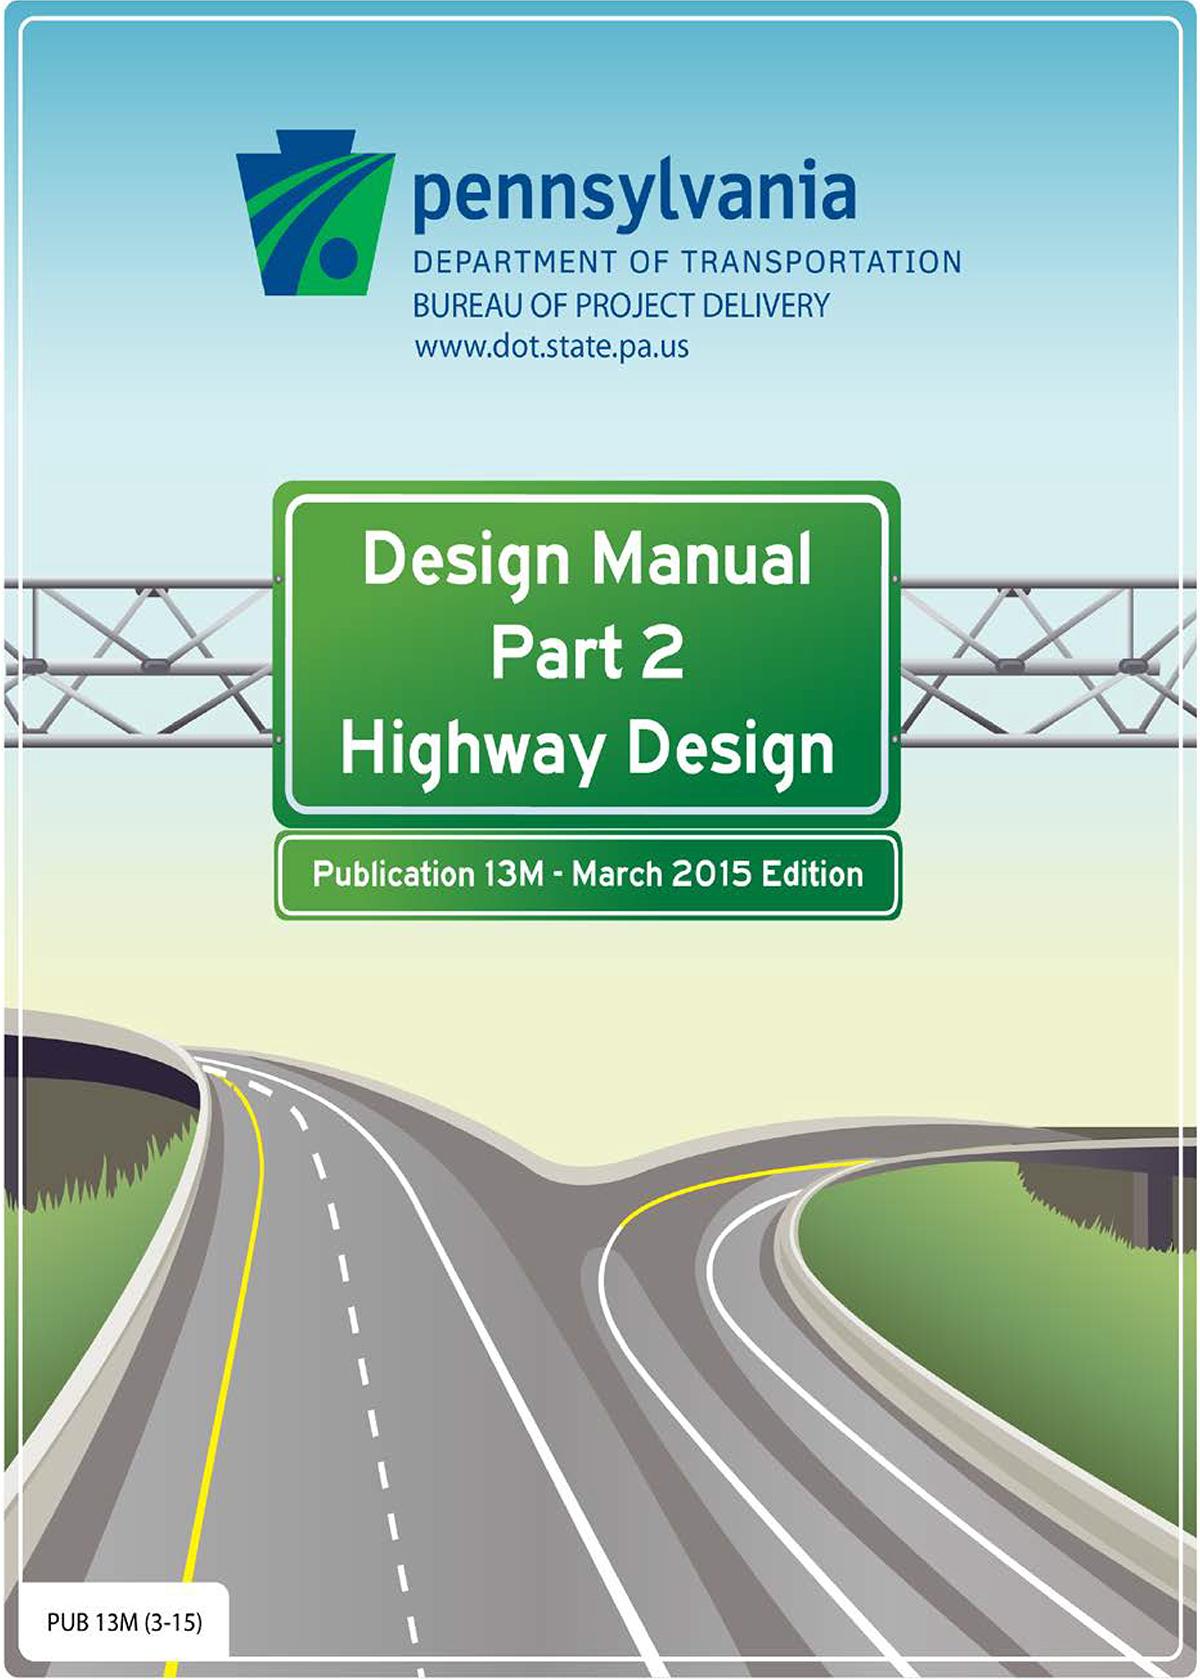 penndot highway design manual rh membership ohiorivertrail org penndot design manual part 5 design manual 3 penndot